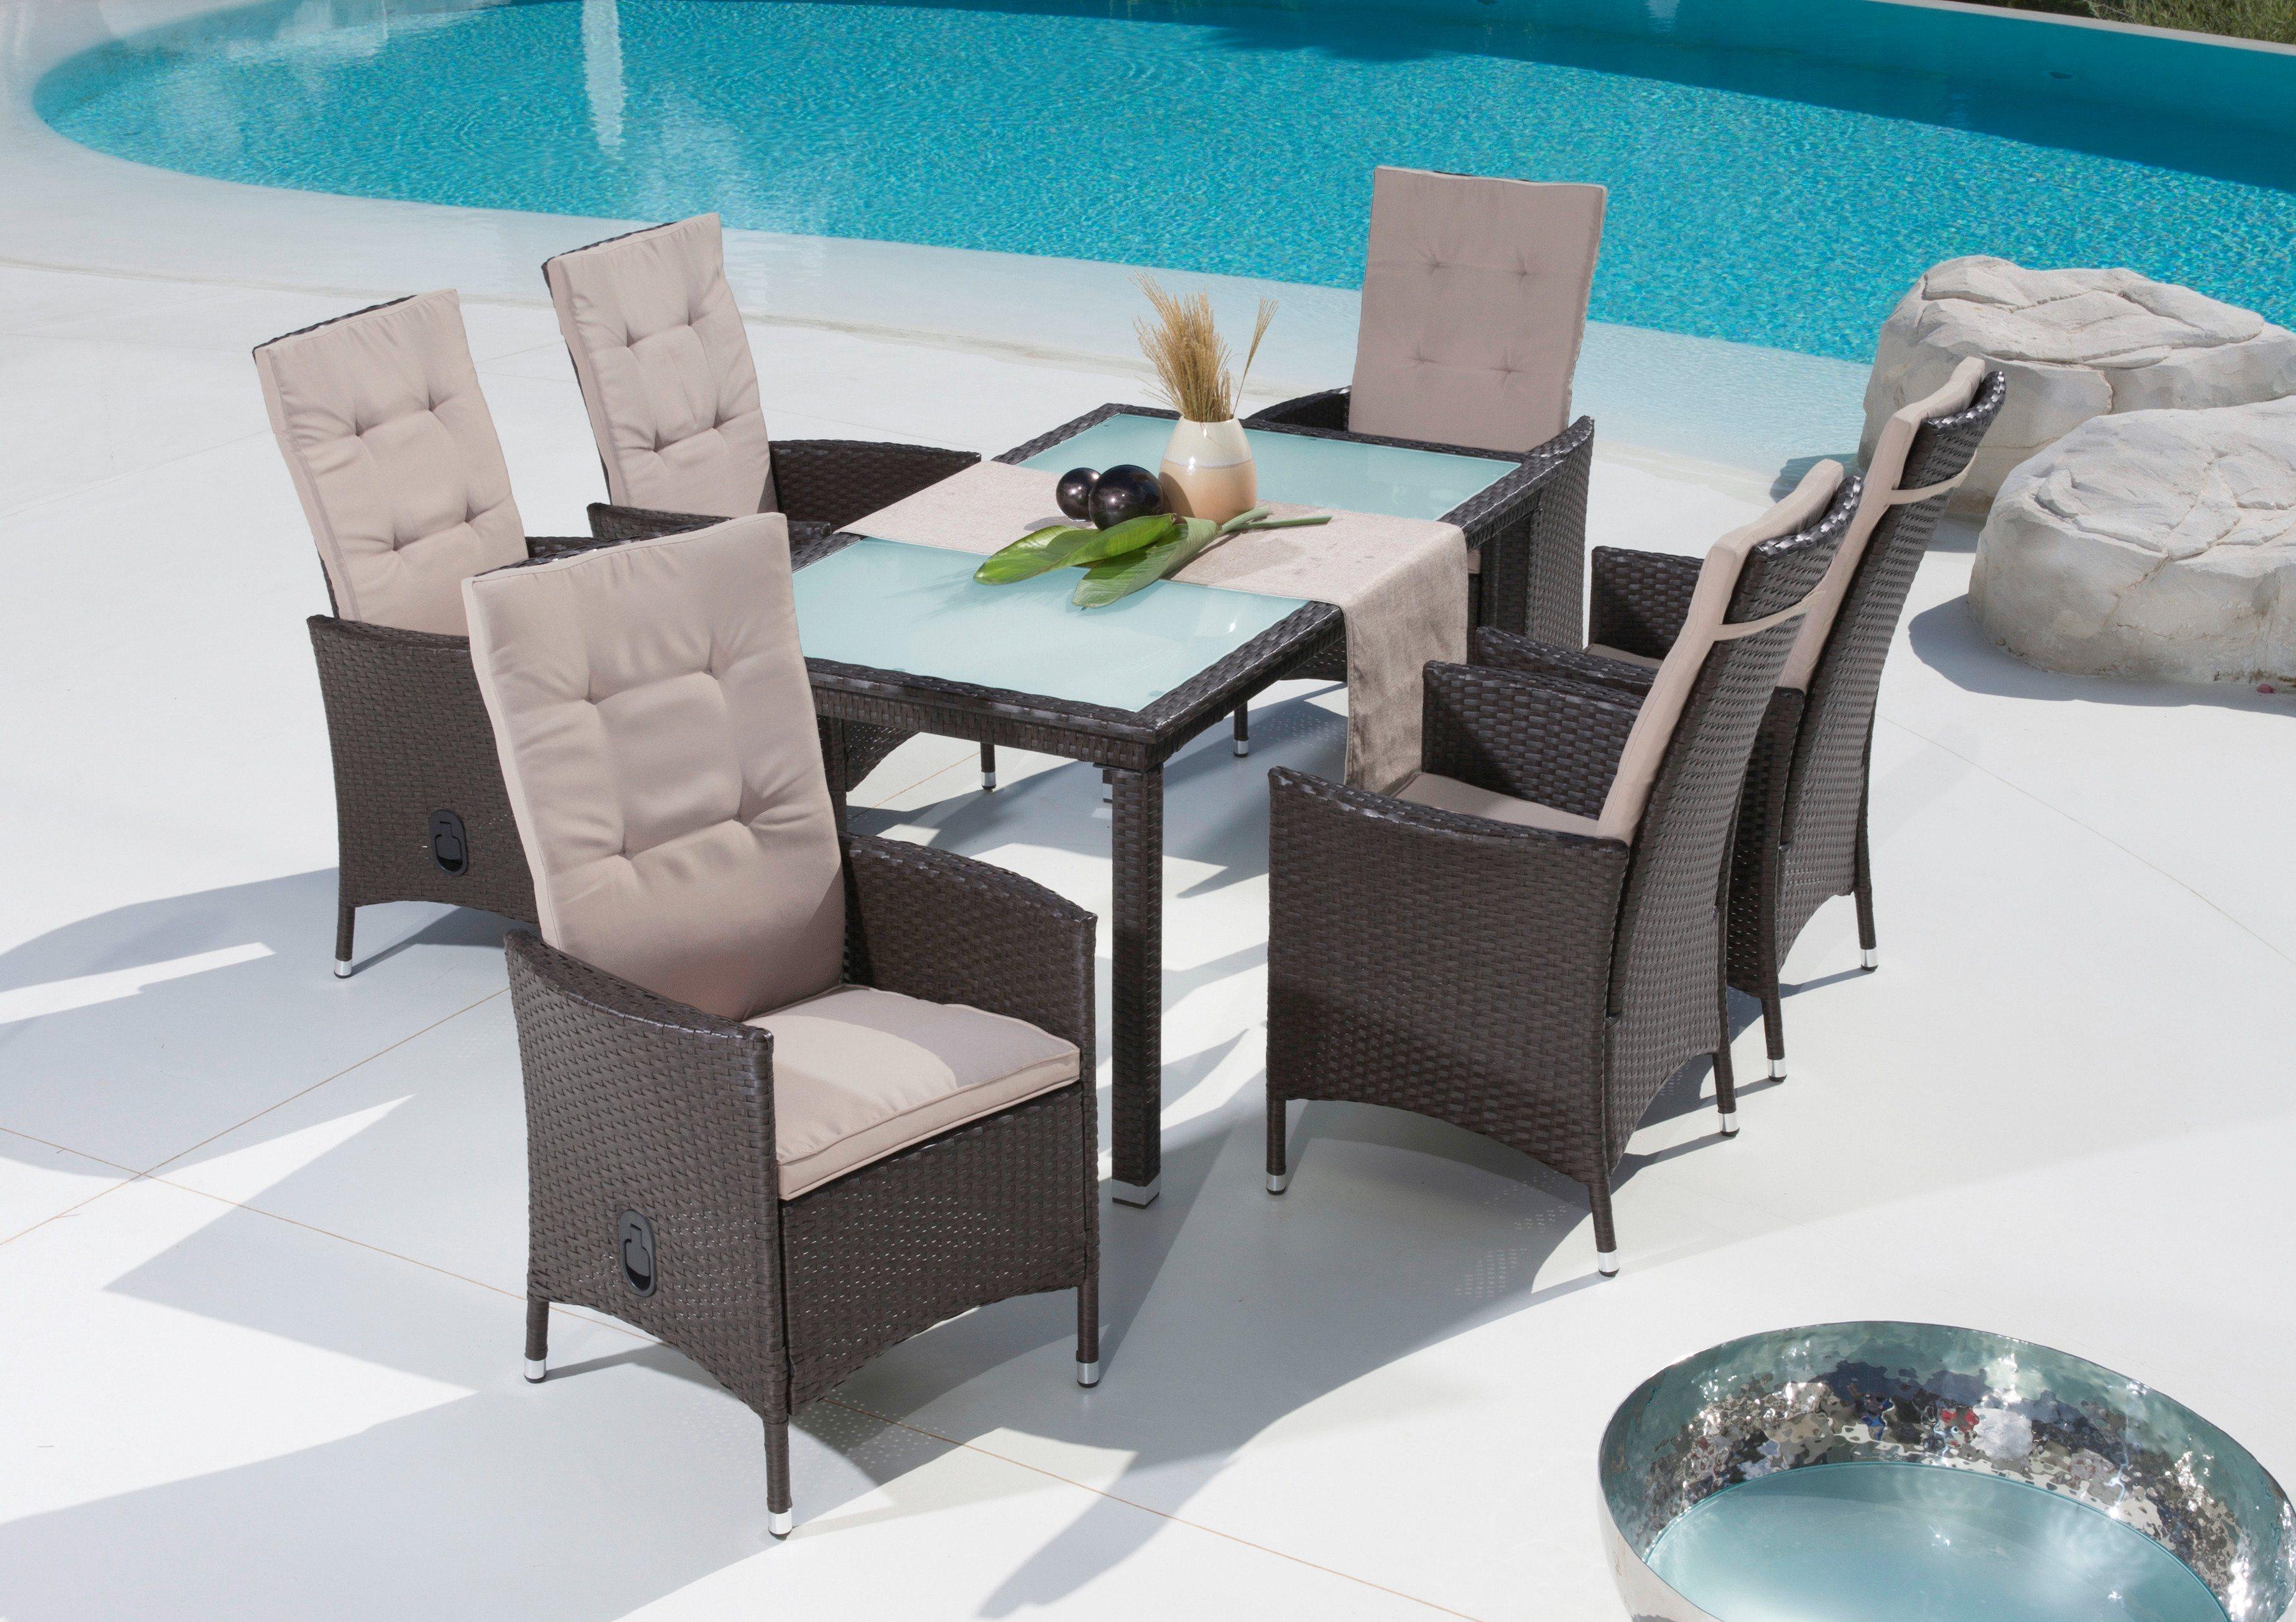 ber 50 sparen garten m bel im angebot cherry m bel. Black Bedroom Furniture Sets. Home Design Ideas